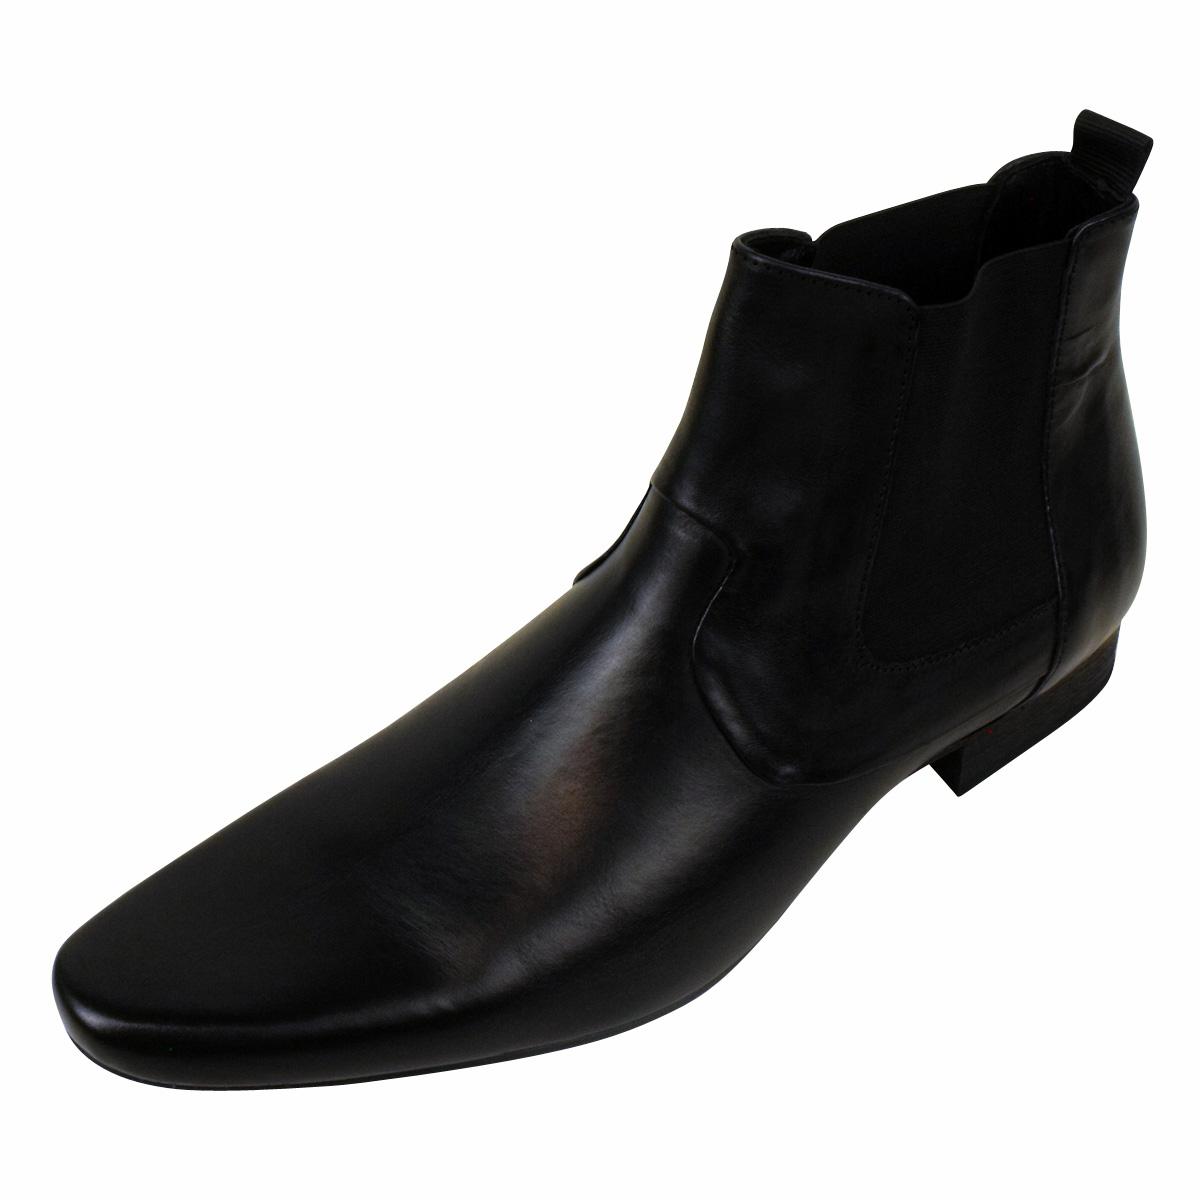 mens h by hudson leather smart chelsea boot soes formal. Black Bedroom Furniture Sets. Home Design Ideas